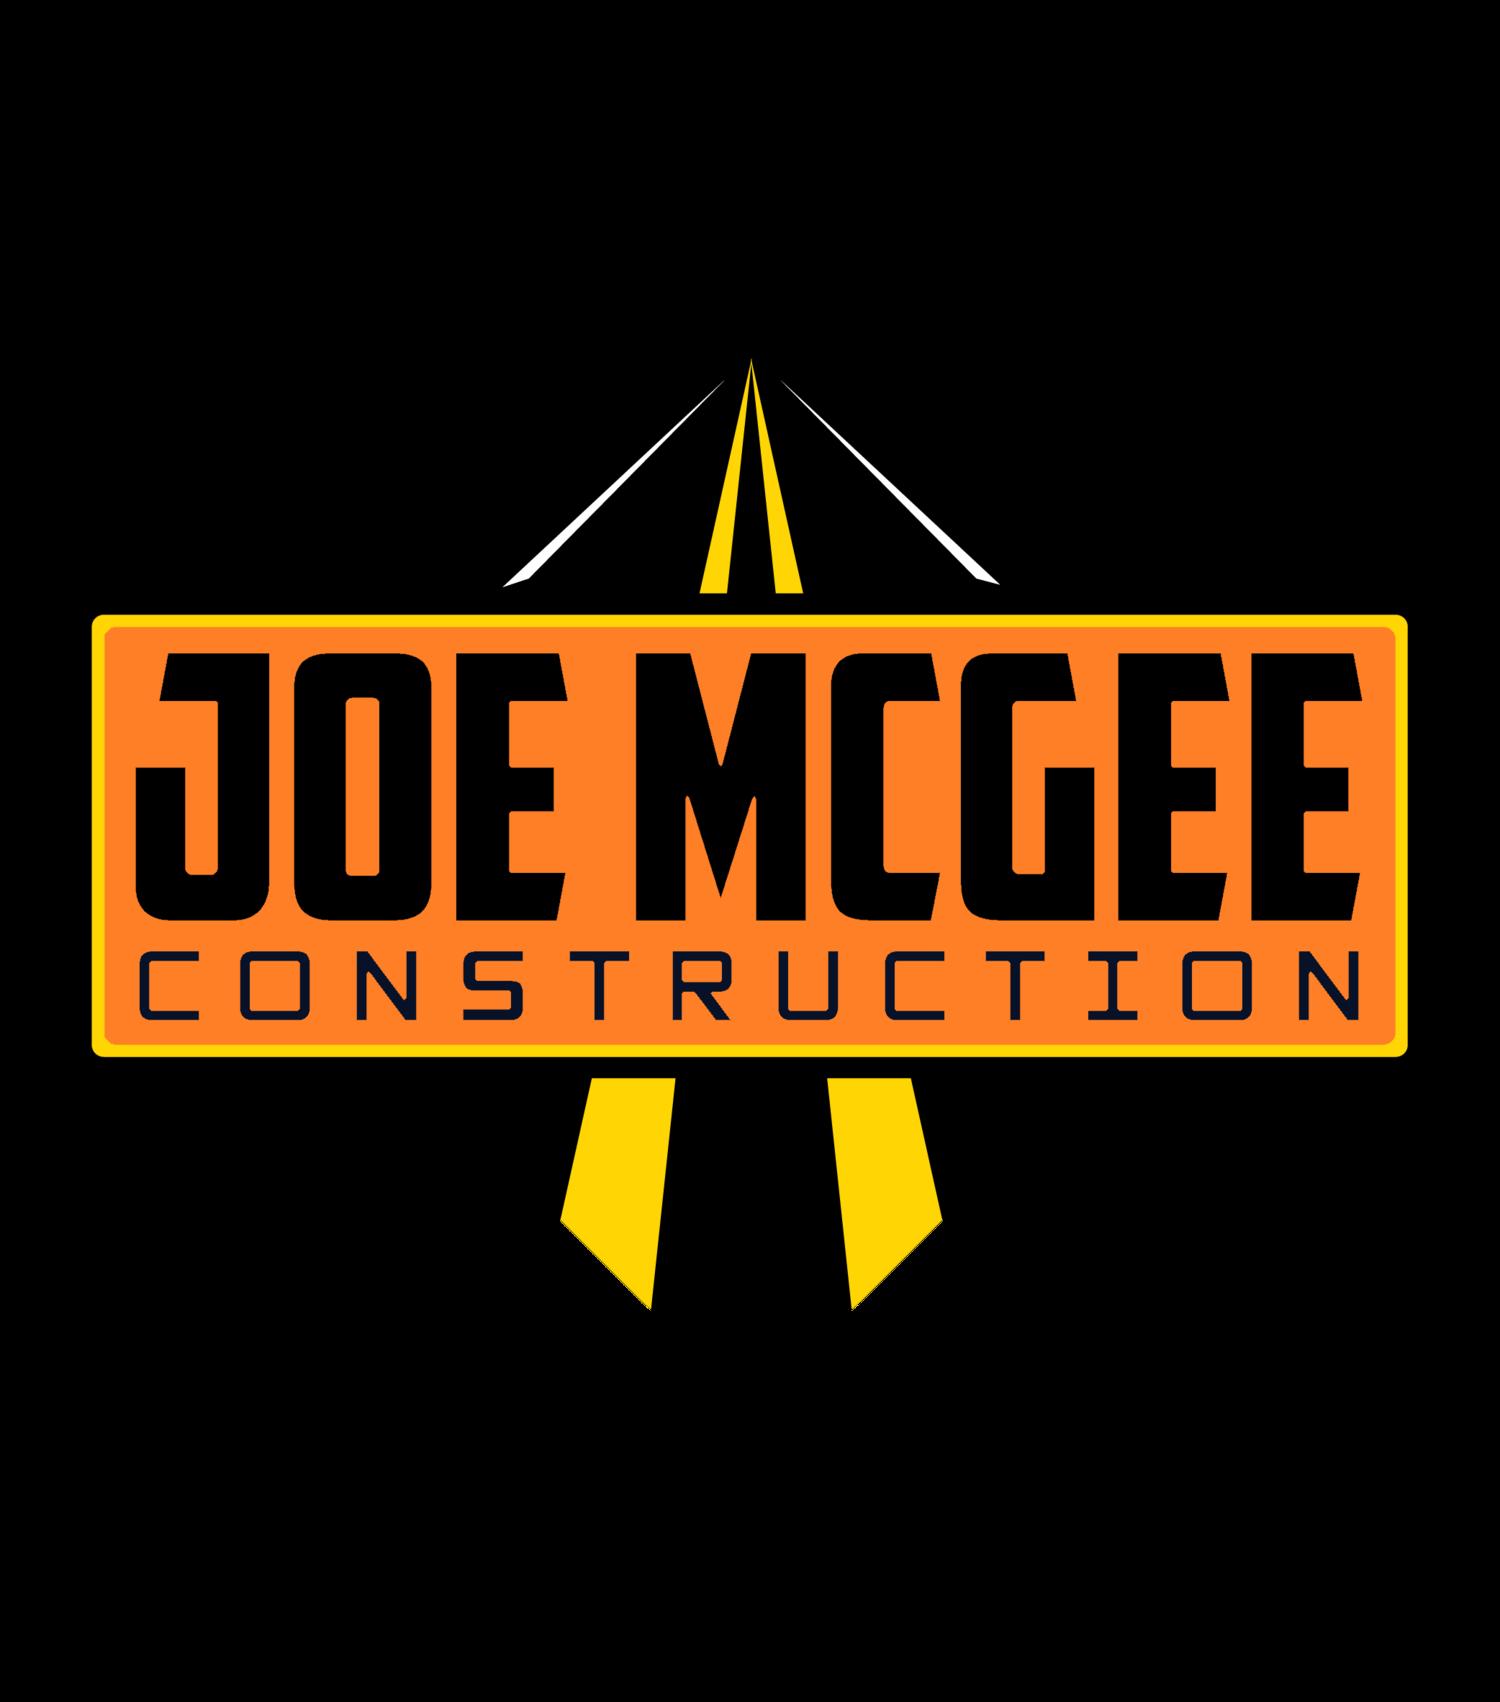 Joe Mcgee Construction Joe Mcgee Construction